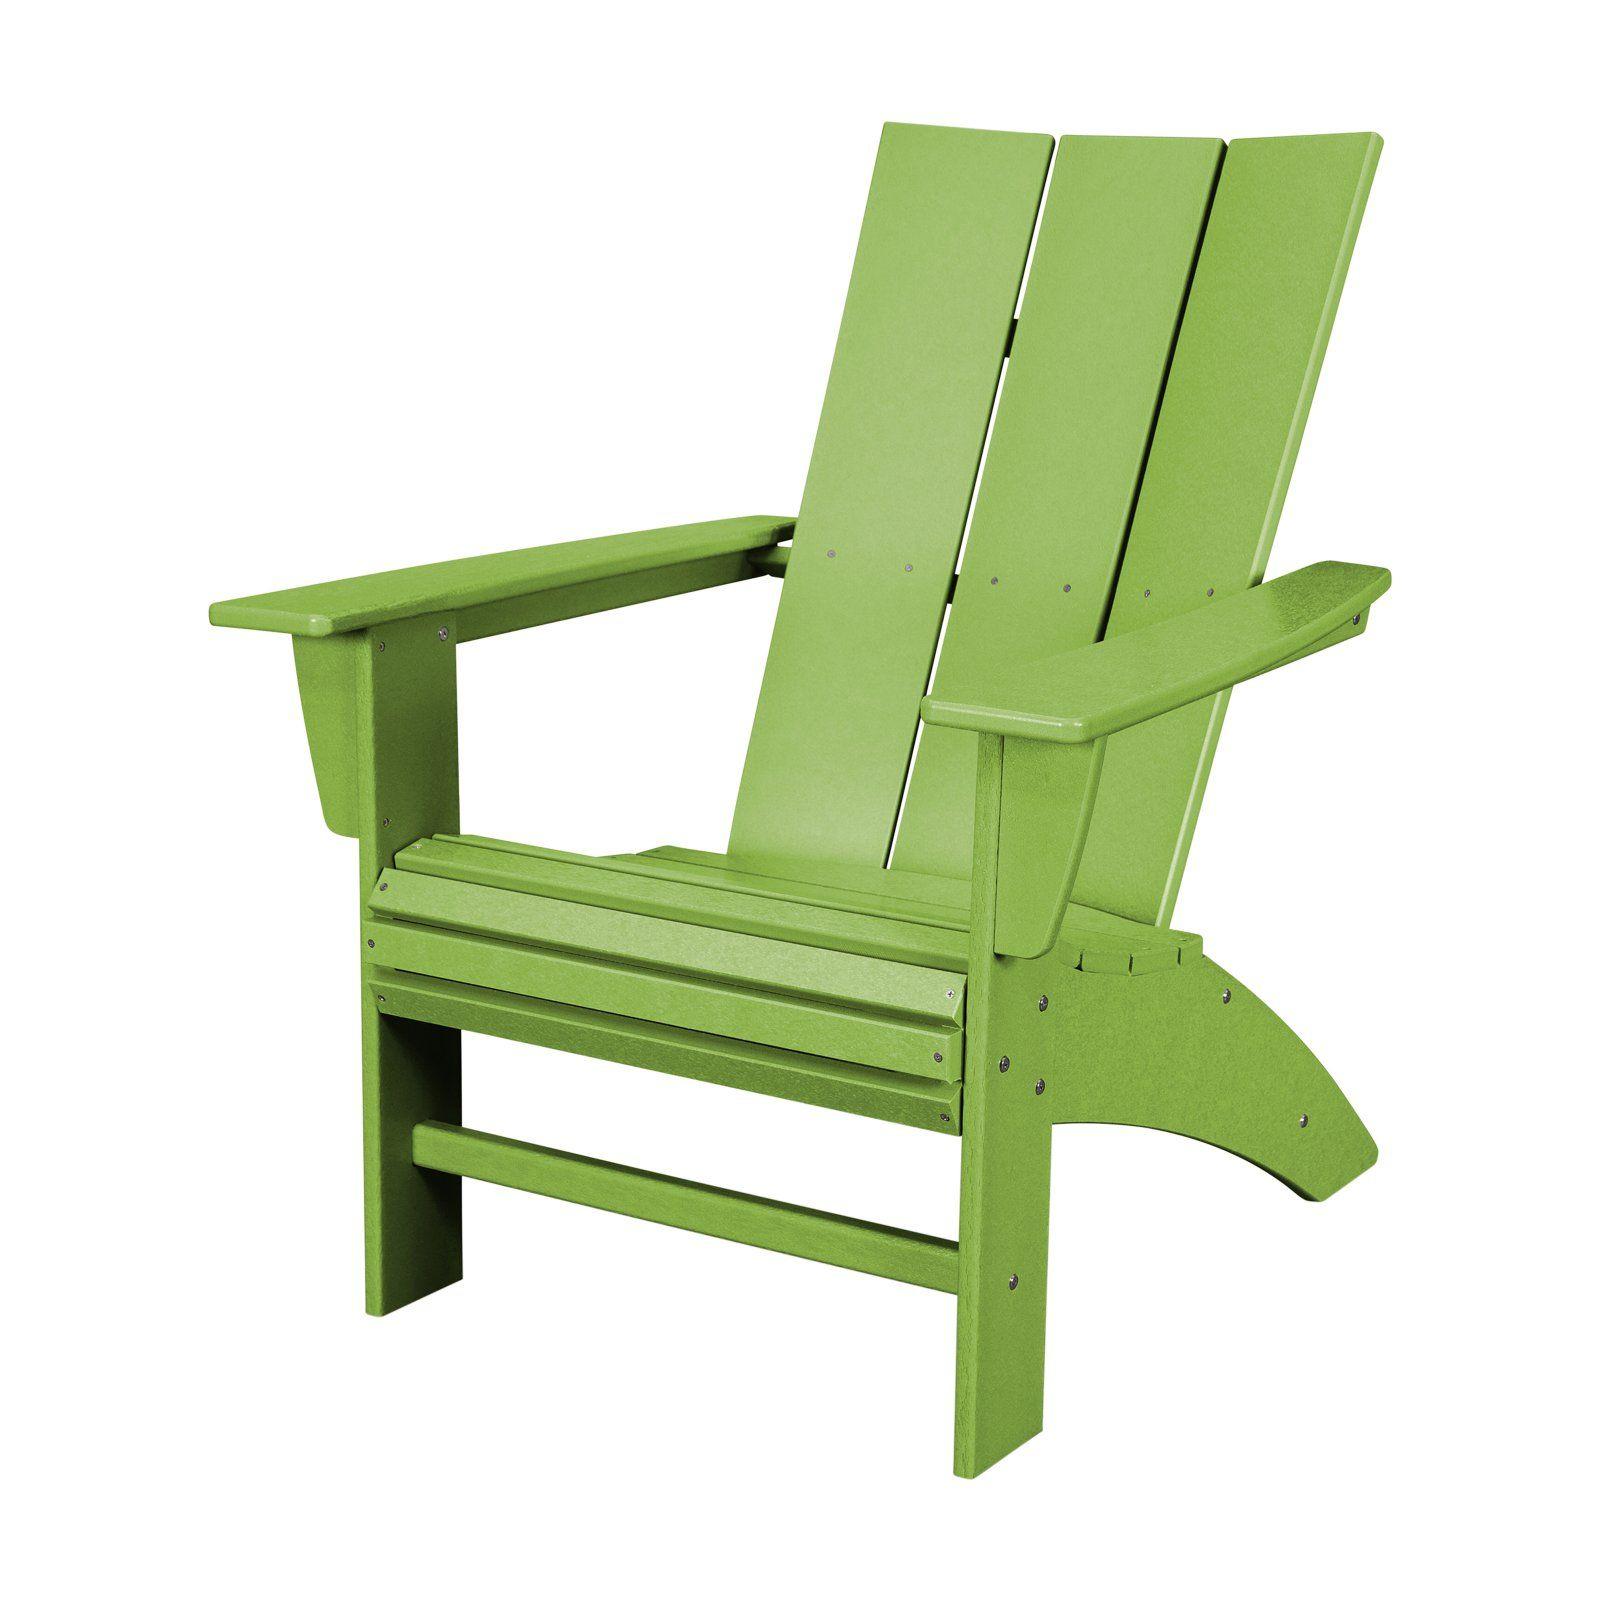 POLYWOOD Modern Curveback Adirondack Chair Modern